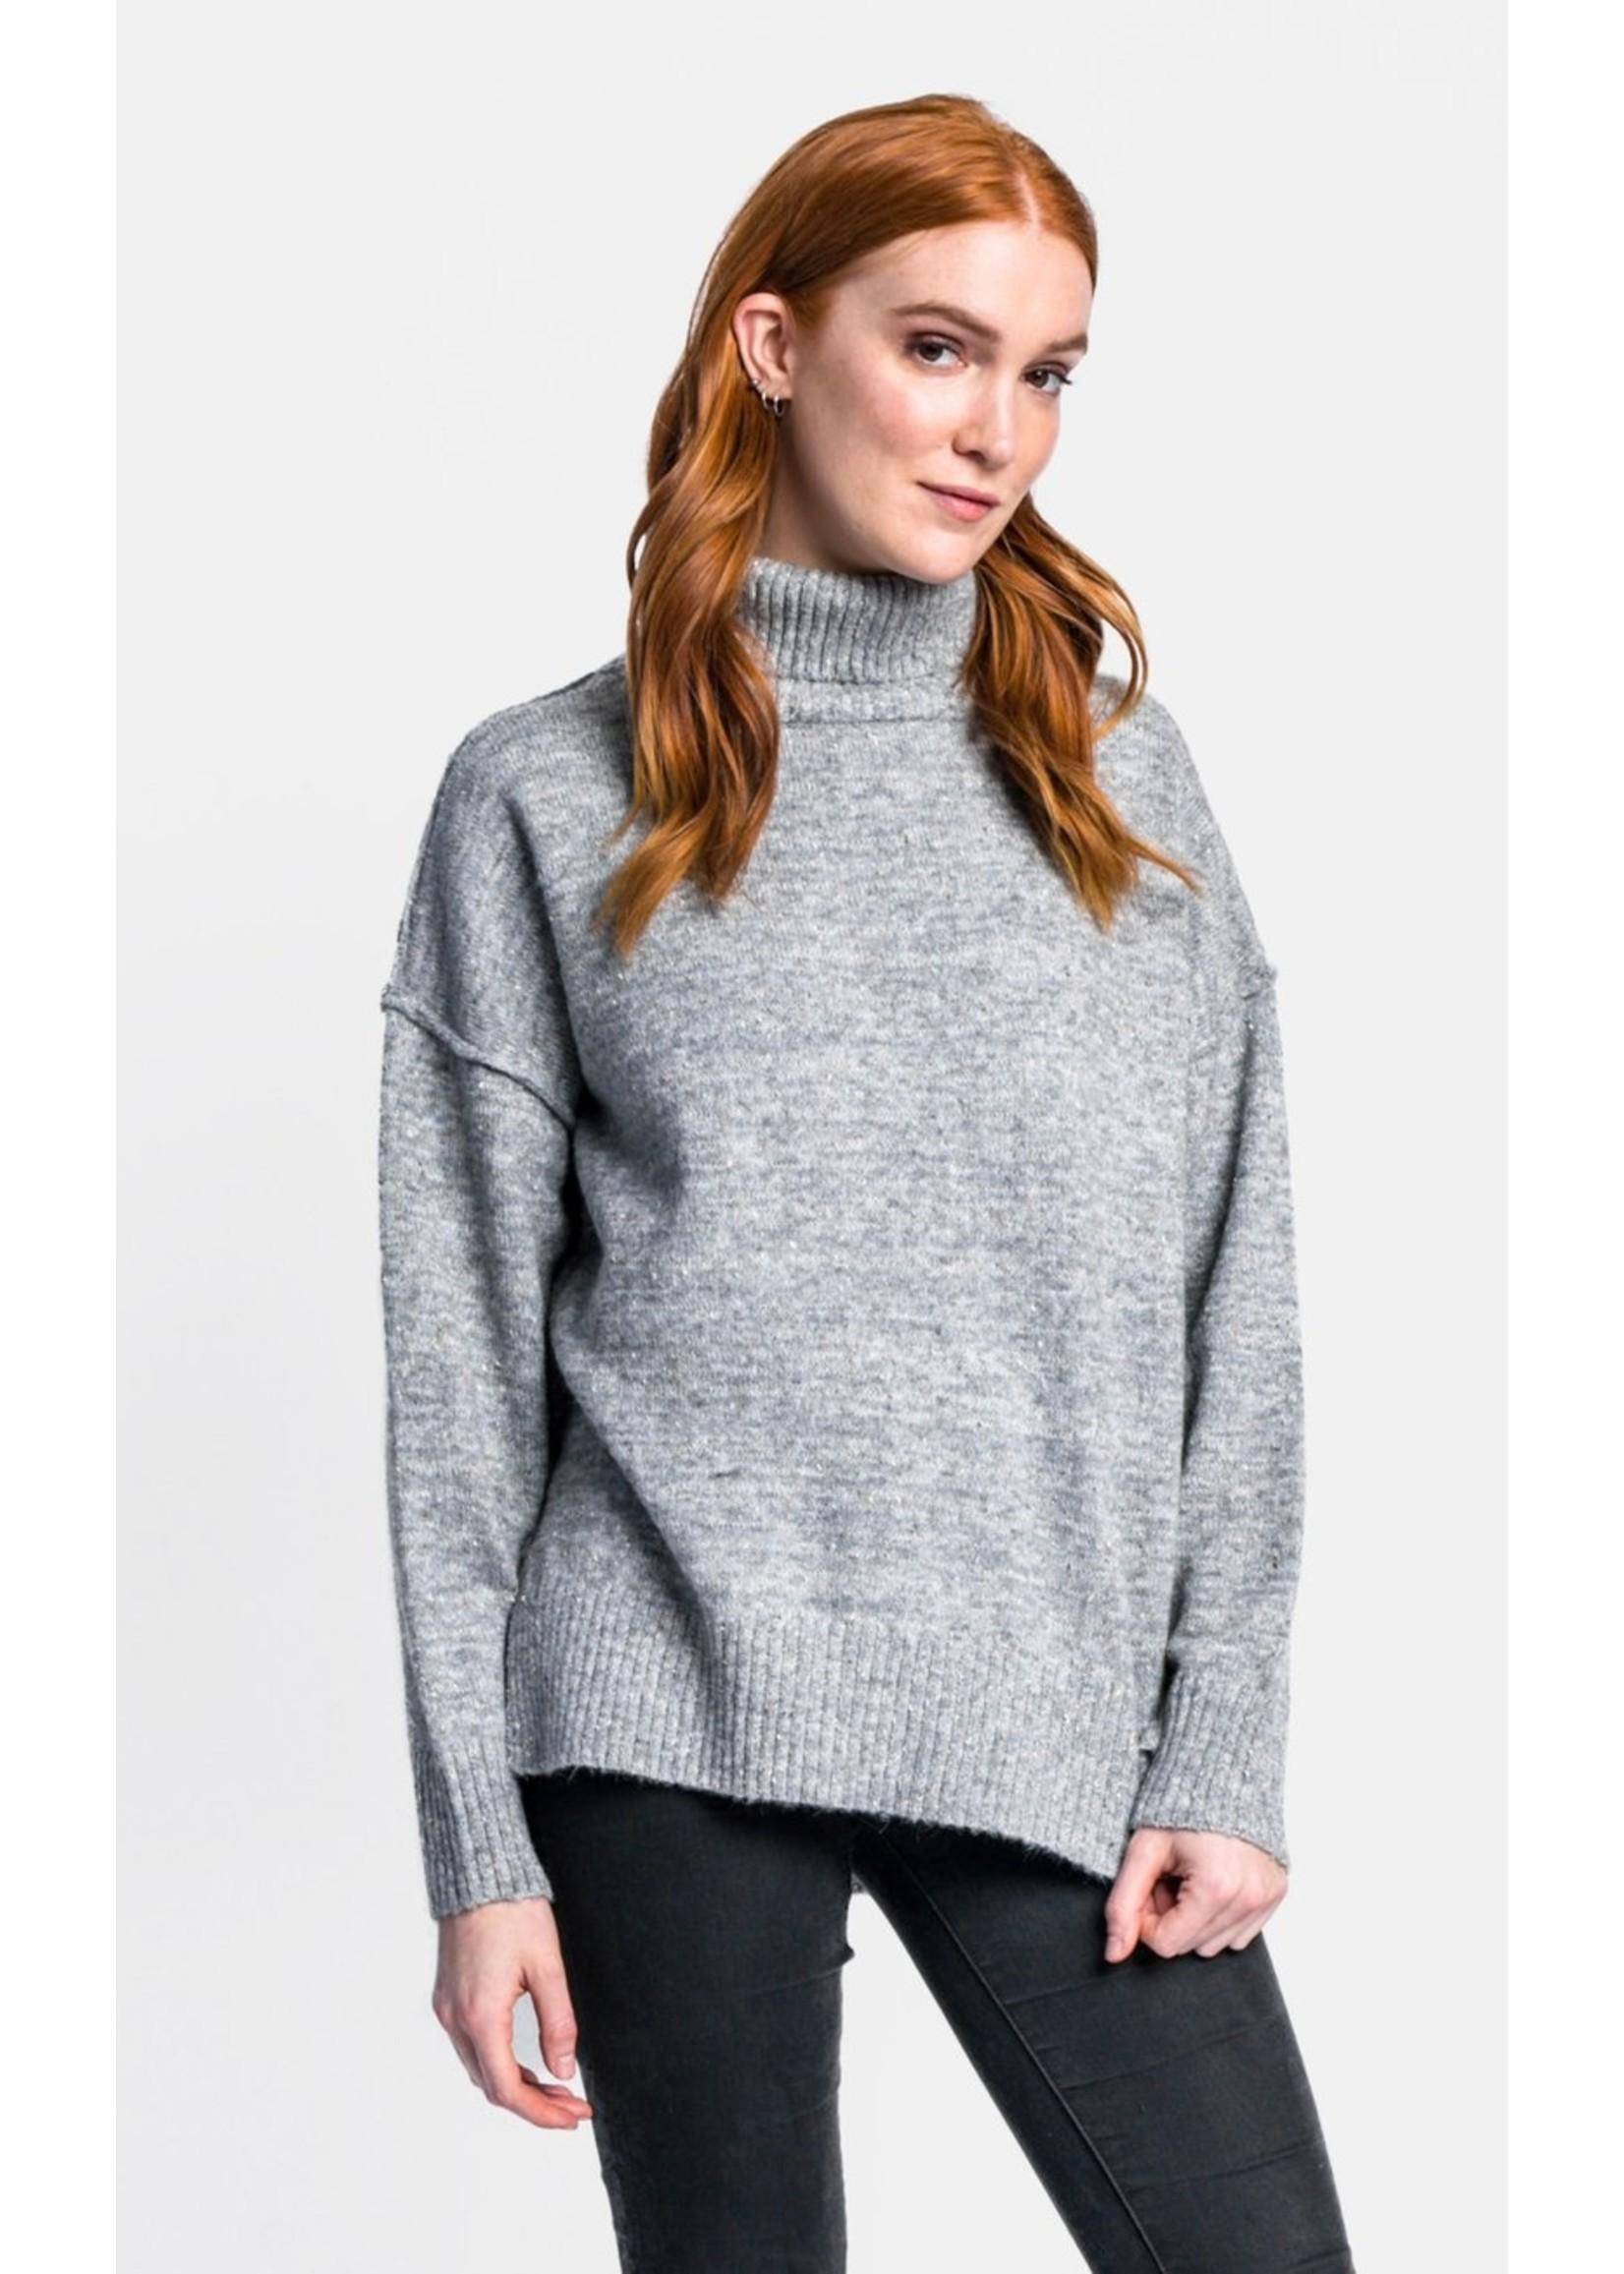 Pink Martini Mock It To Me Sweater